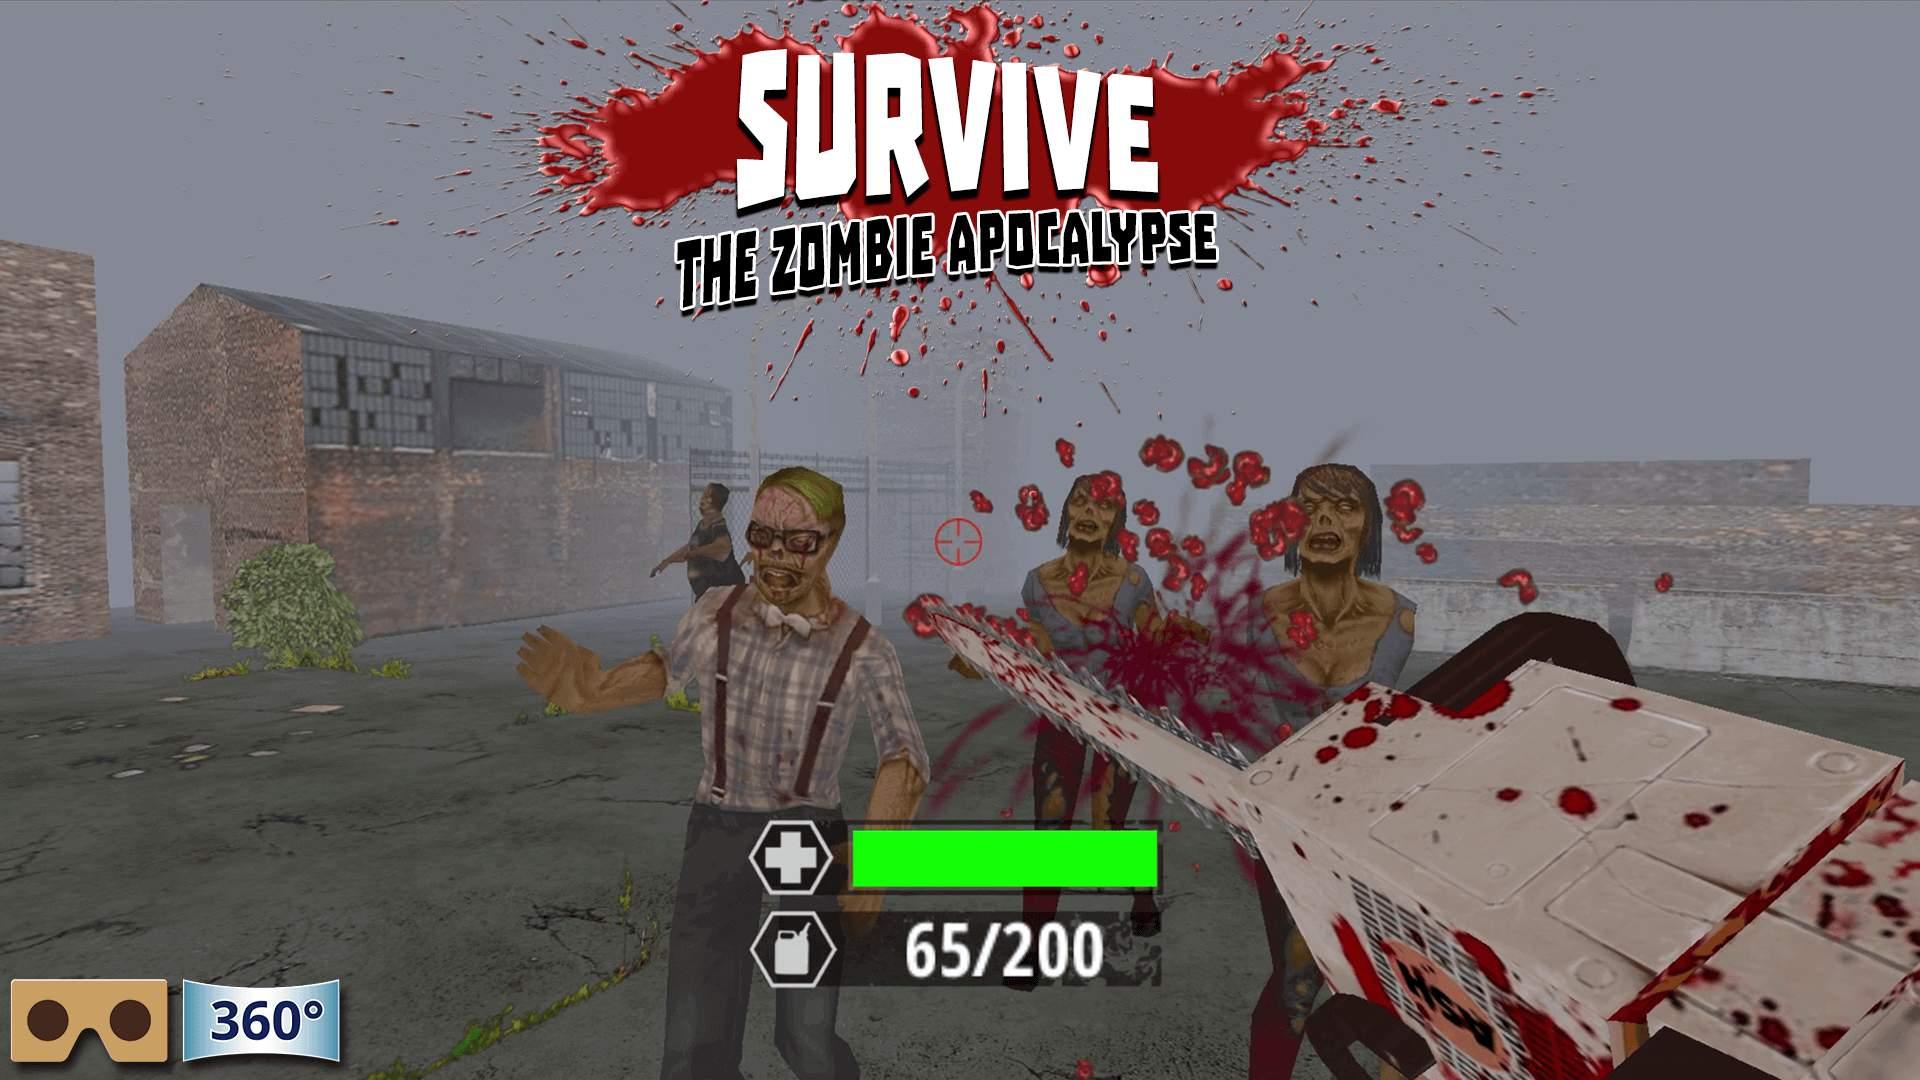 I Slay Zombies - VR Shooter Screenshot 01